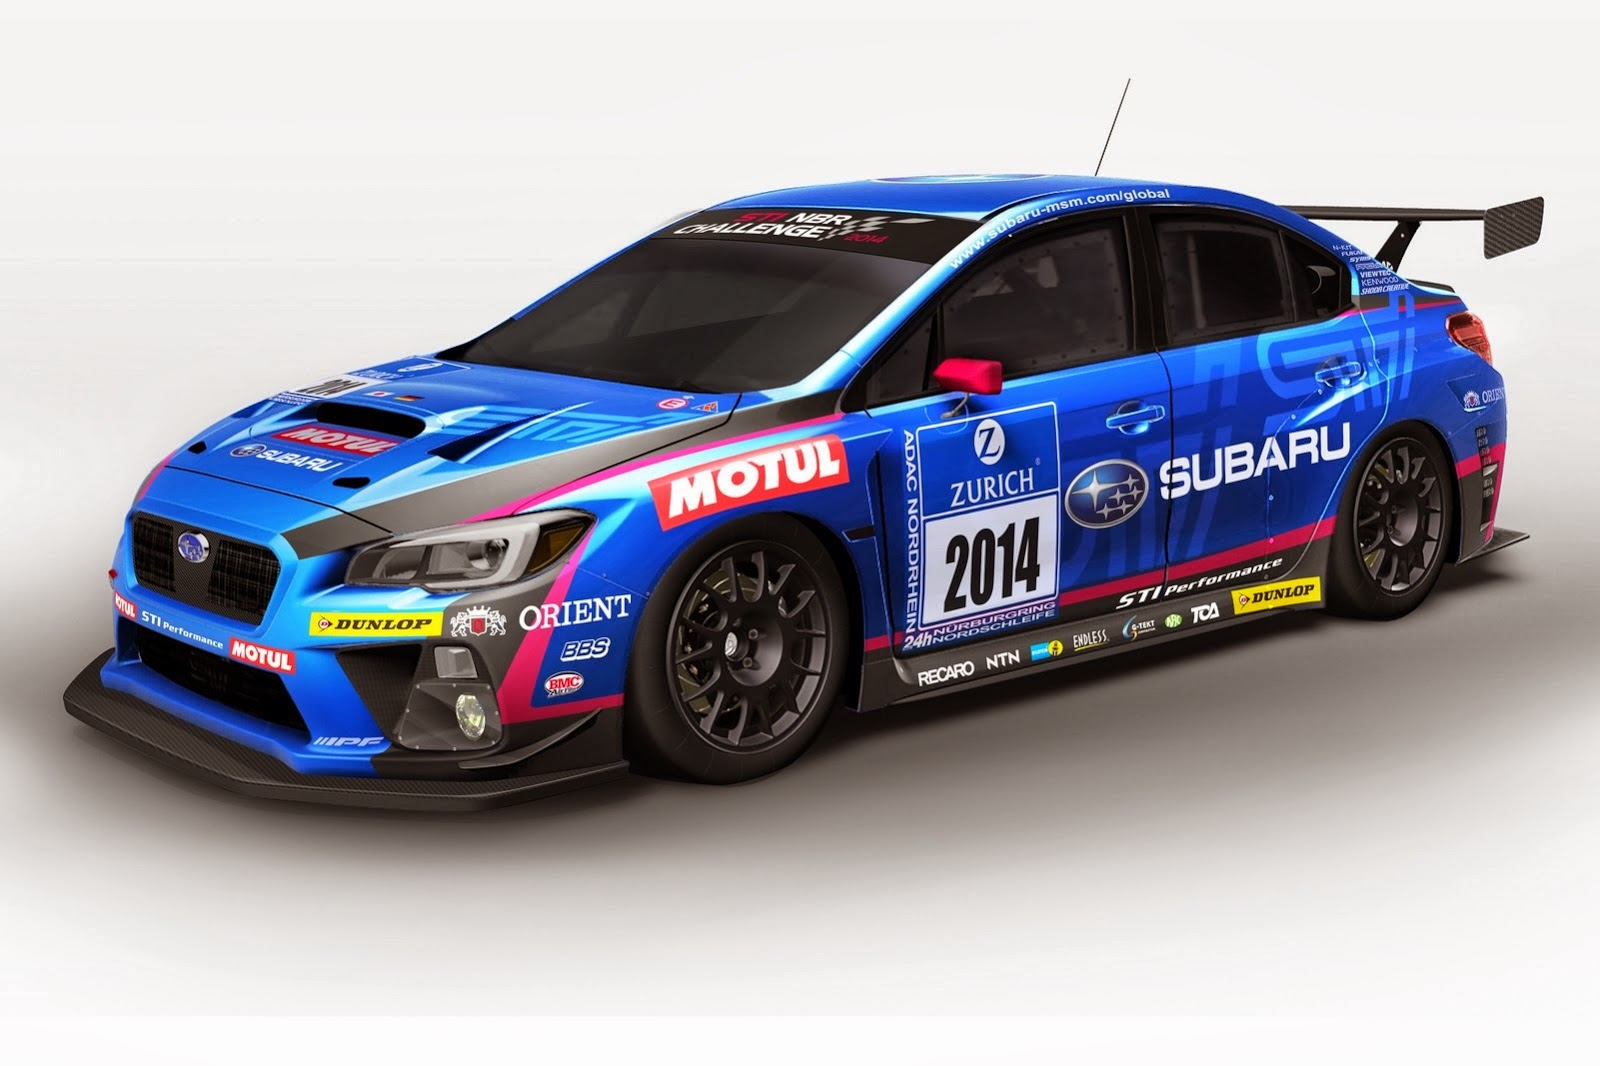 Limo For Sale >> Subaru Reveals Their WRX STI Nurburgring Racer